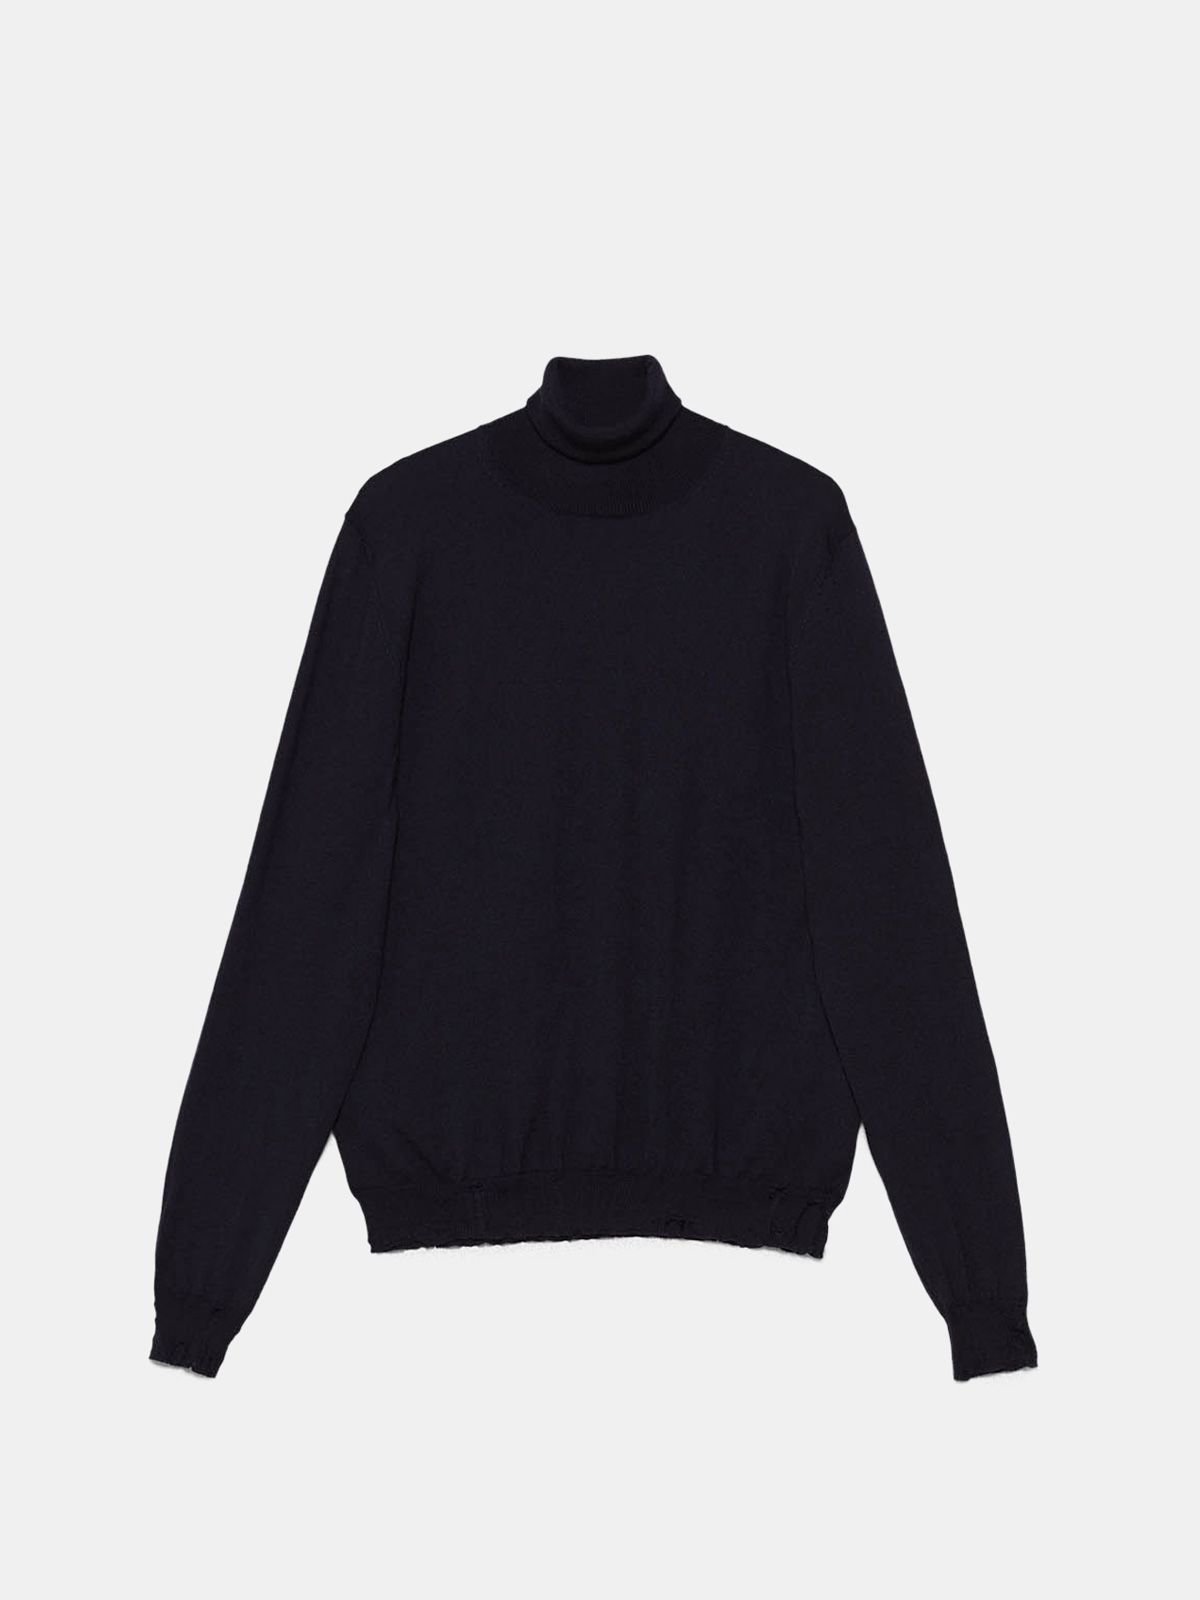 Golden Goose - Tomio turtleneck sweater in extrafine merino wool  in